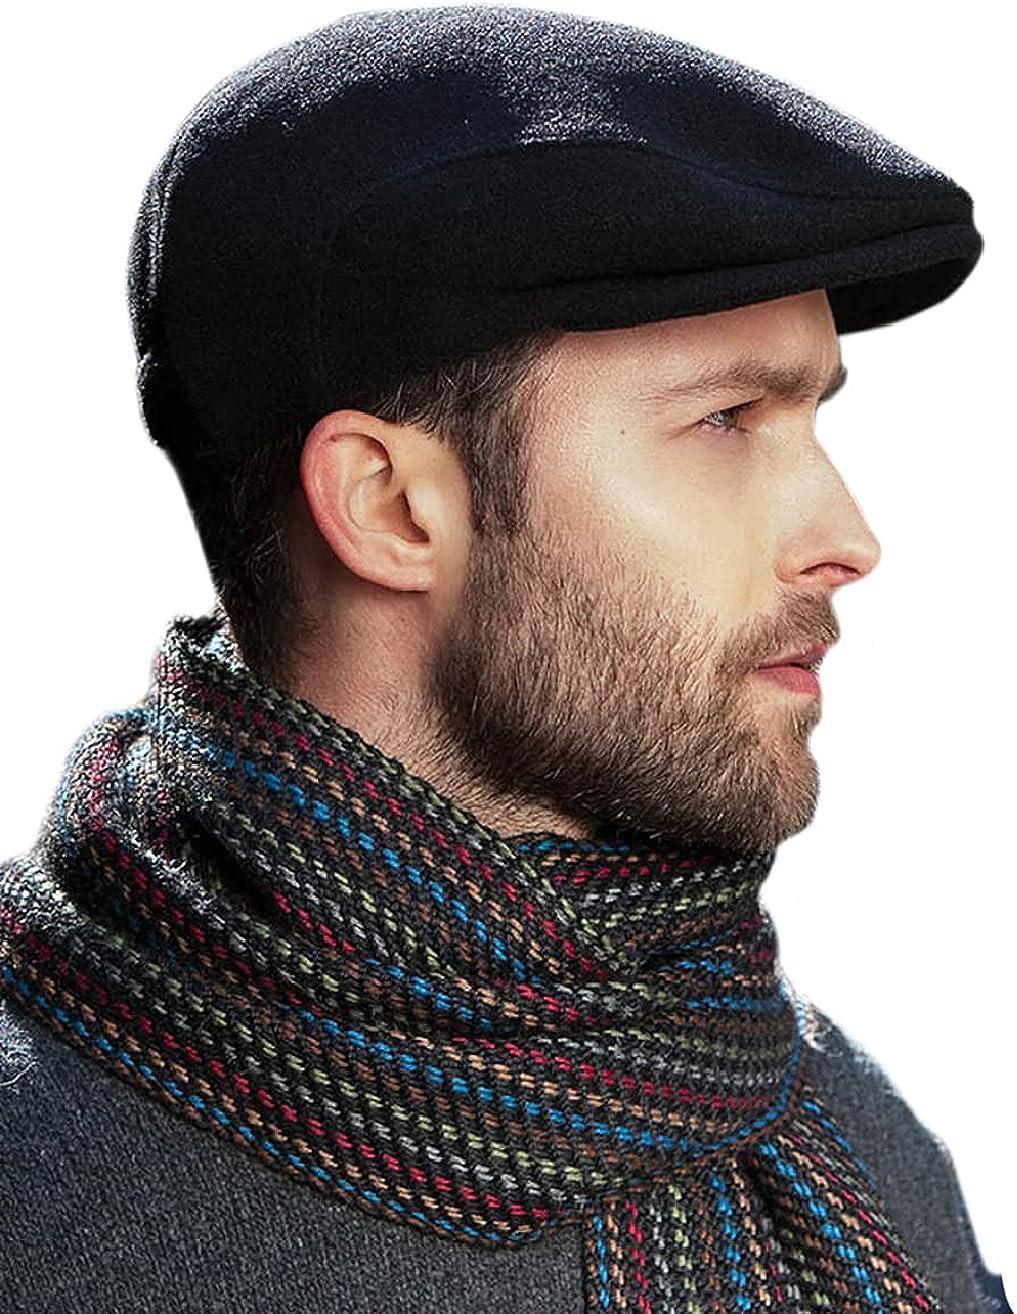 Irish Trinity Tweed Flat Cap for Men's Made in Ireland